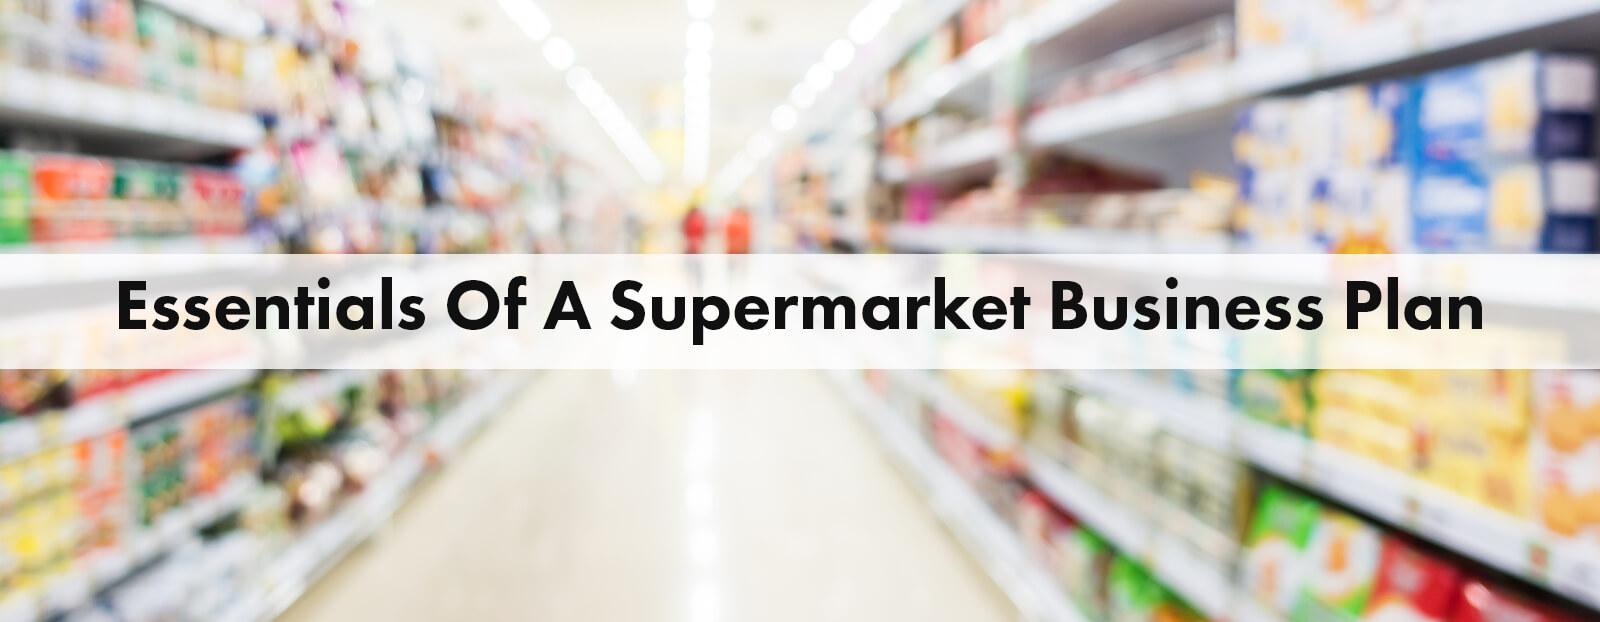 Essentials Of A Supermarket Business Plan